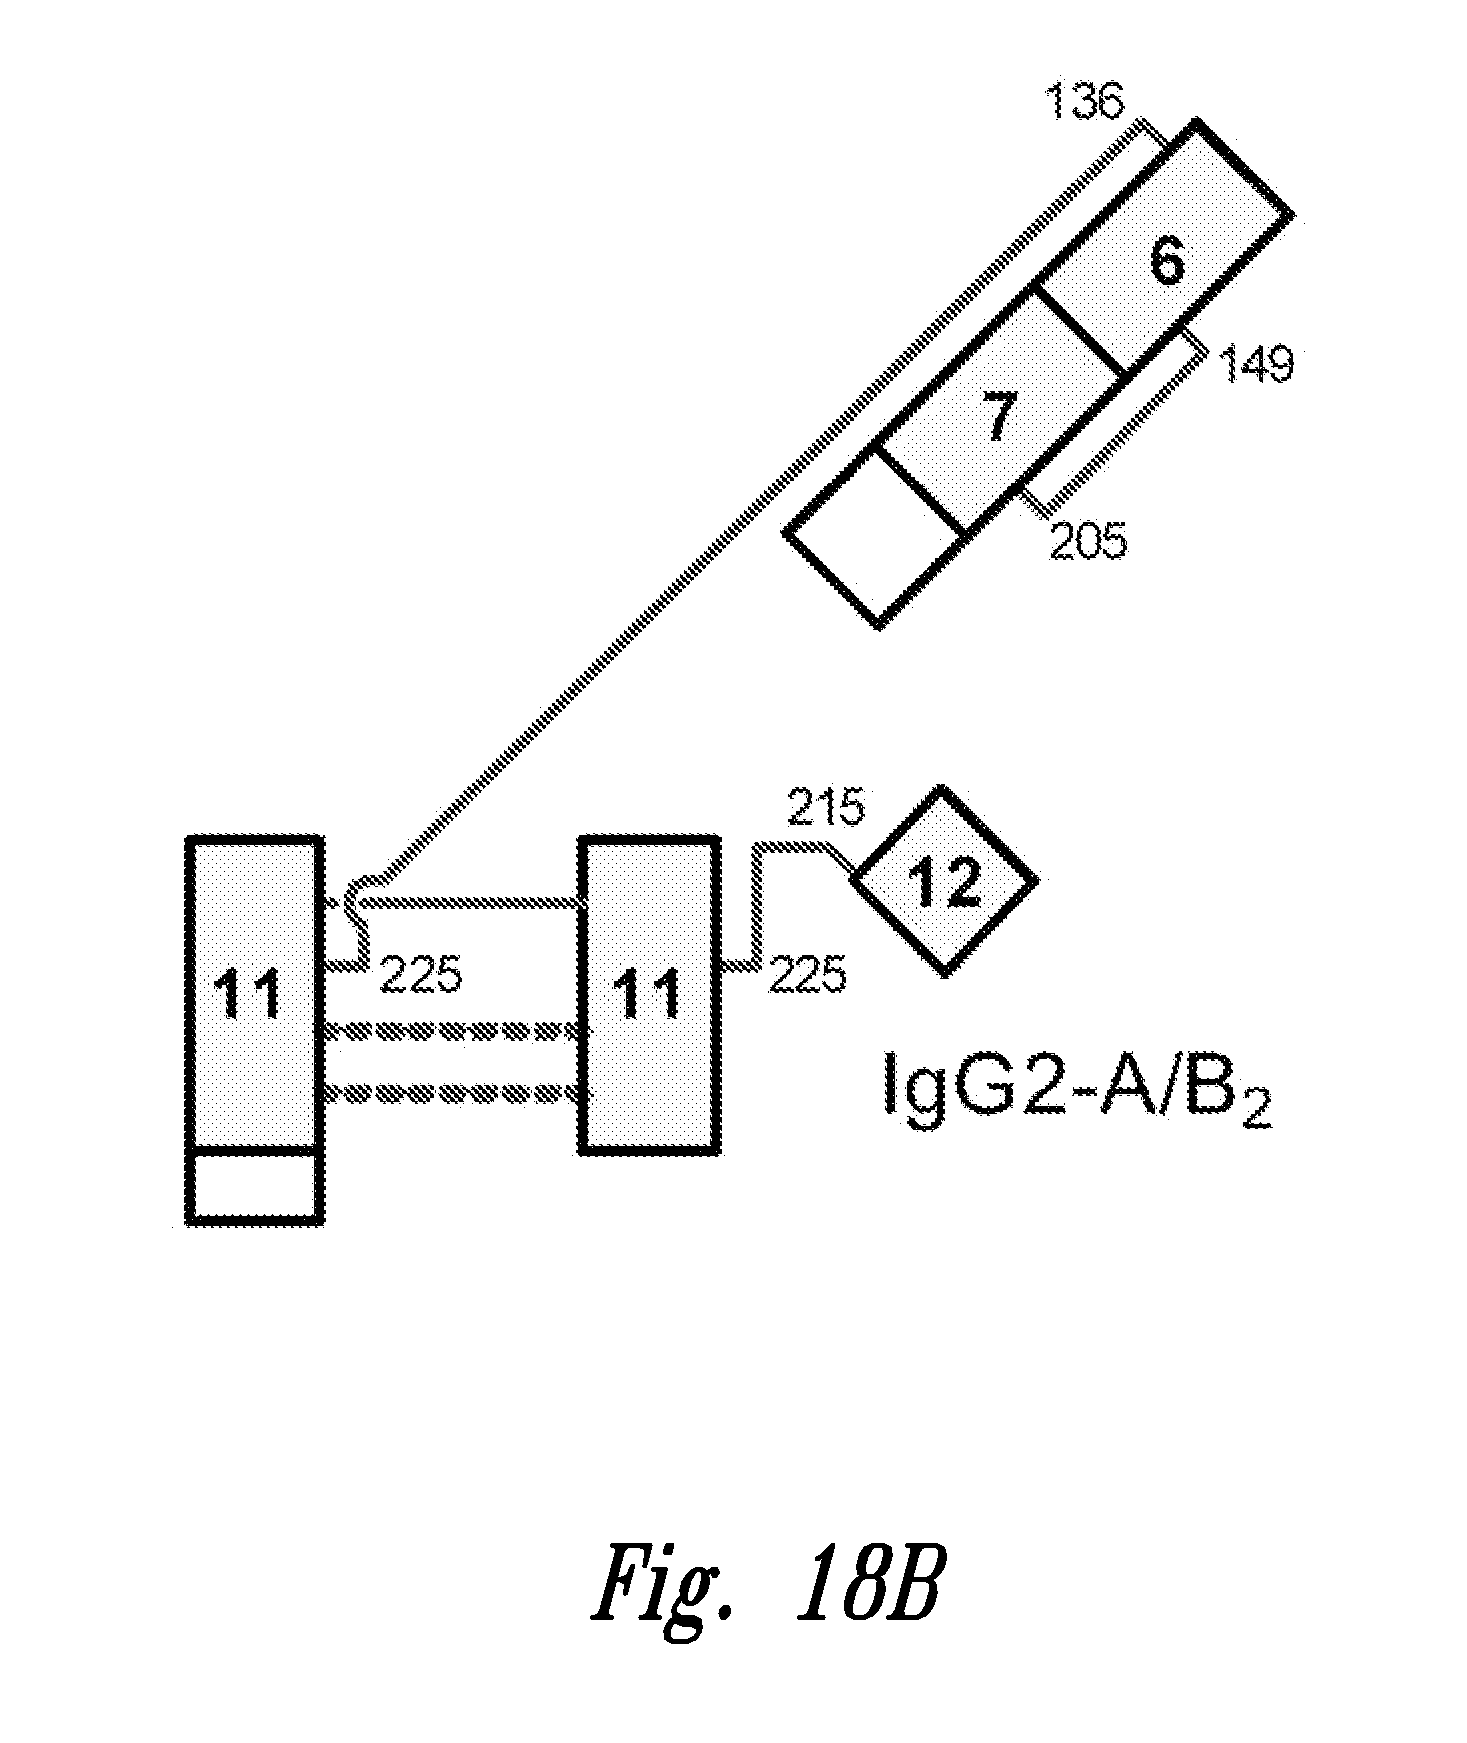 msd distributor wiring diagram wiring diagram and schematic design Msd 6al To Hei Wiring Diagram msd 6al wiring hei php diagram chevy v8 msd 6al to hei wiring diagram